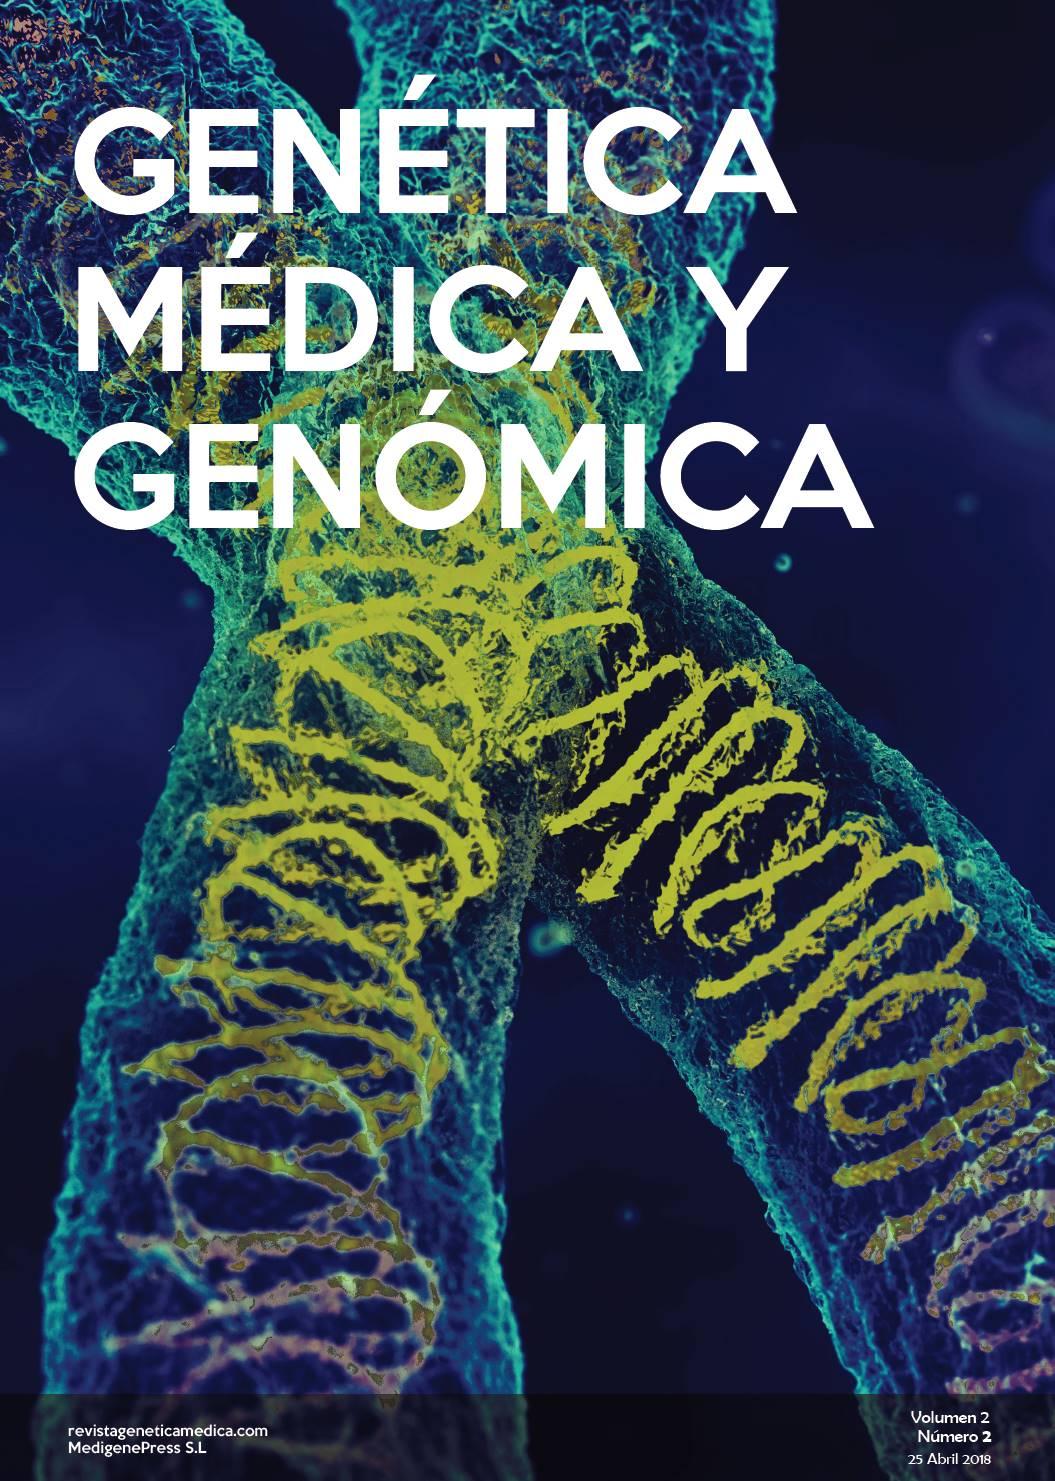 editorial genética médica